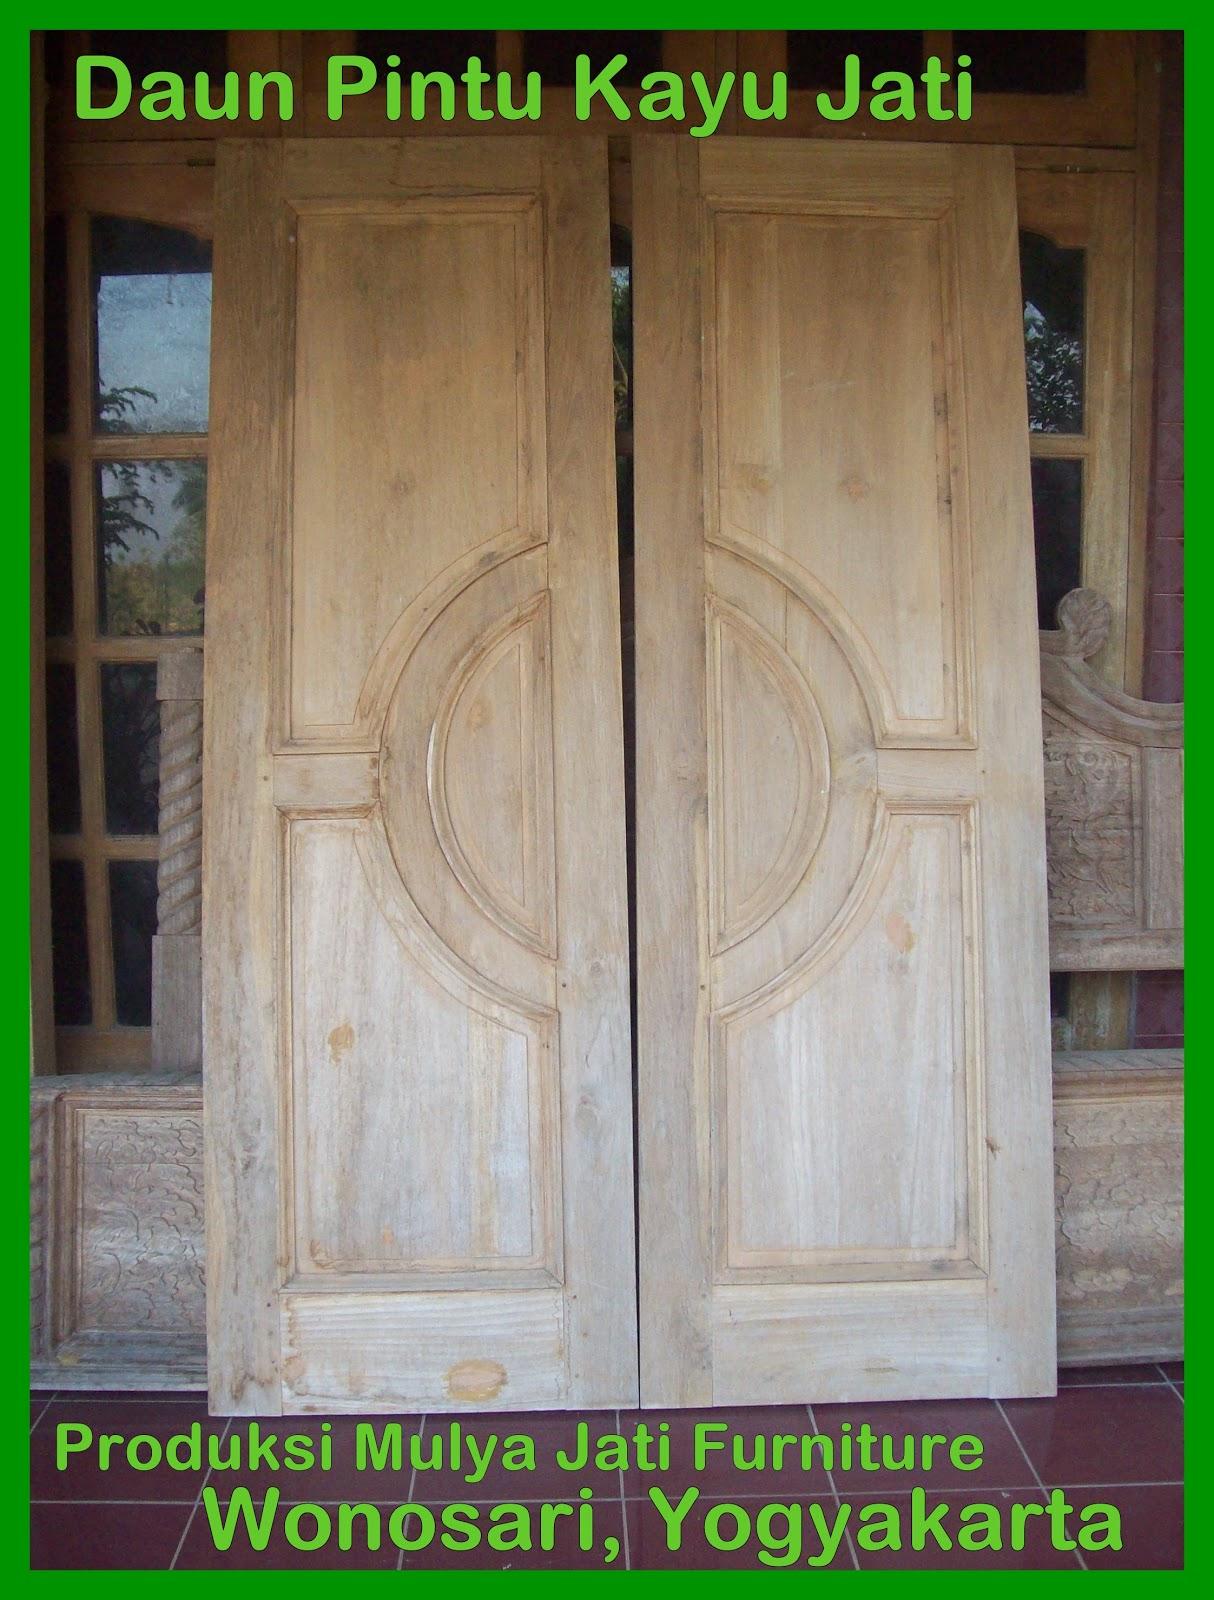 Mulya Jati Furniture Daun Pintu Kayu Jati Ukuran Besar